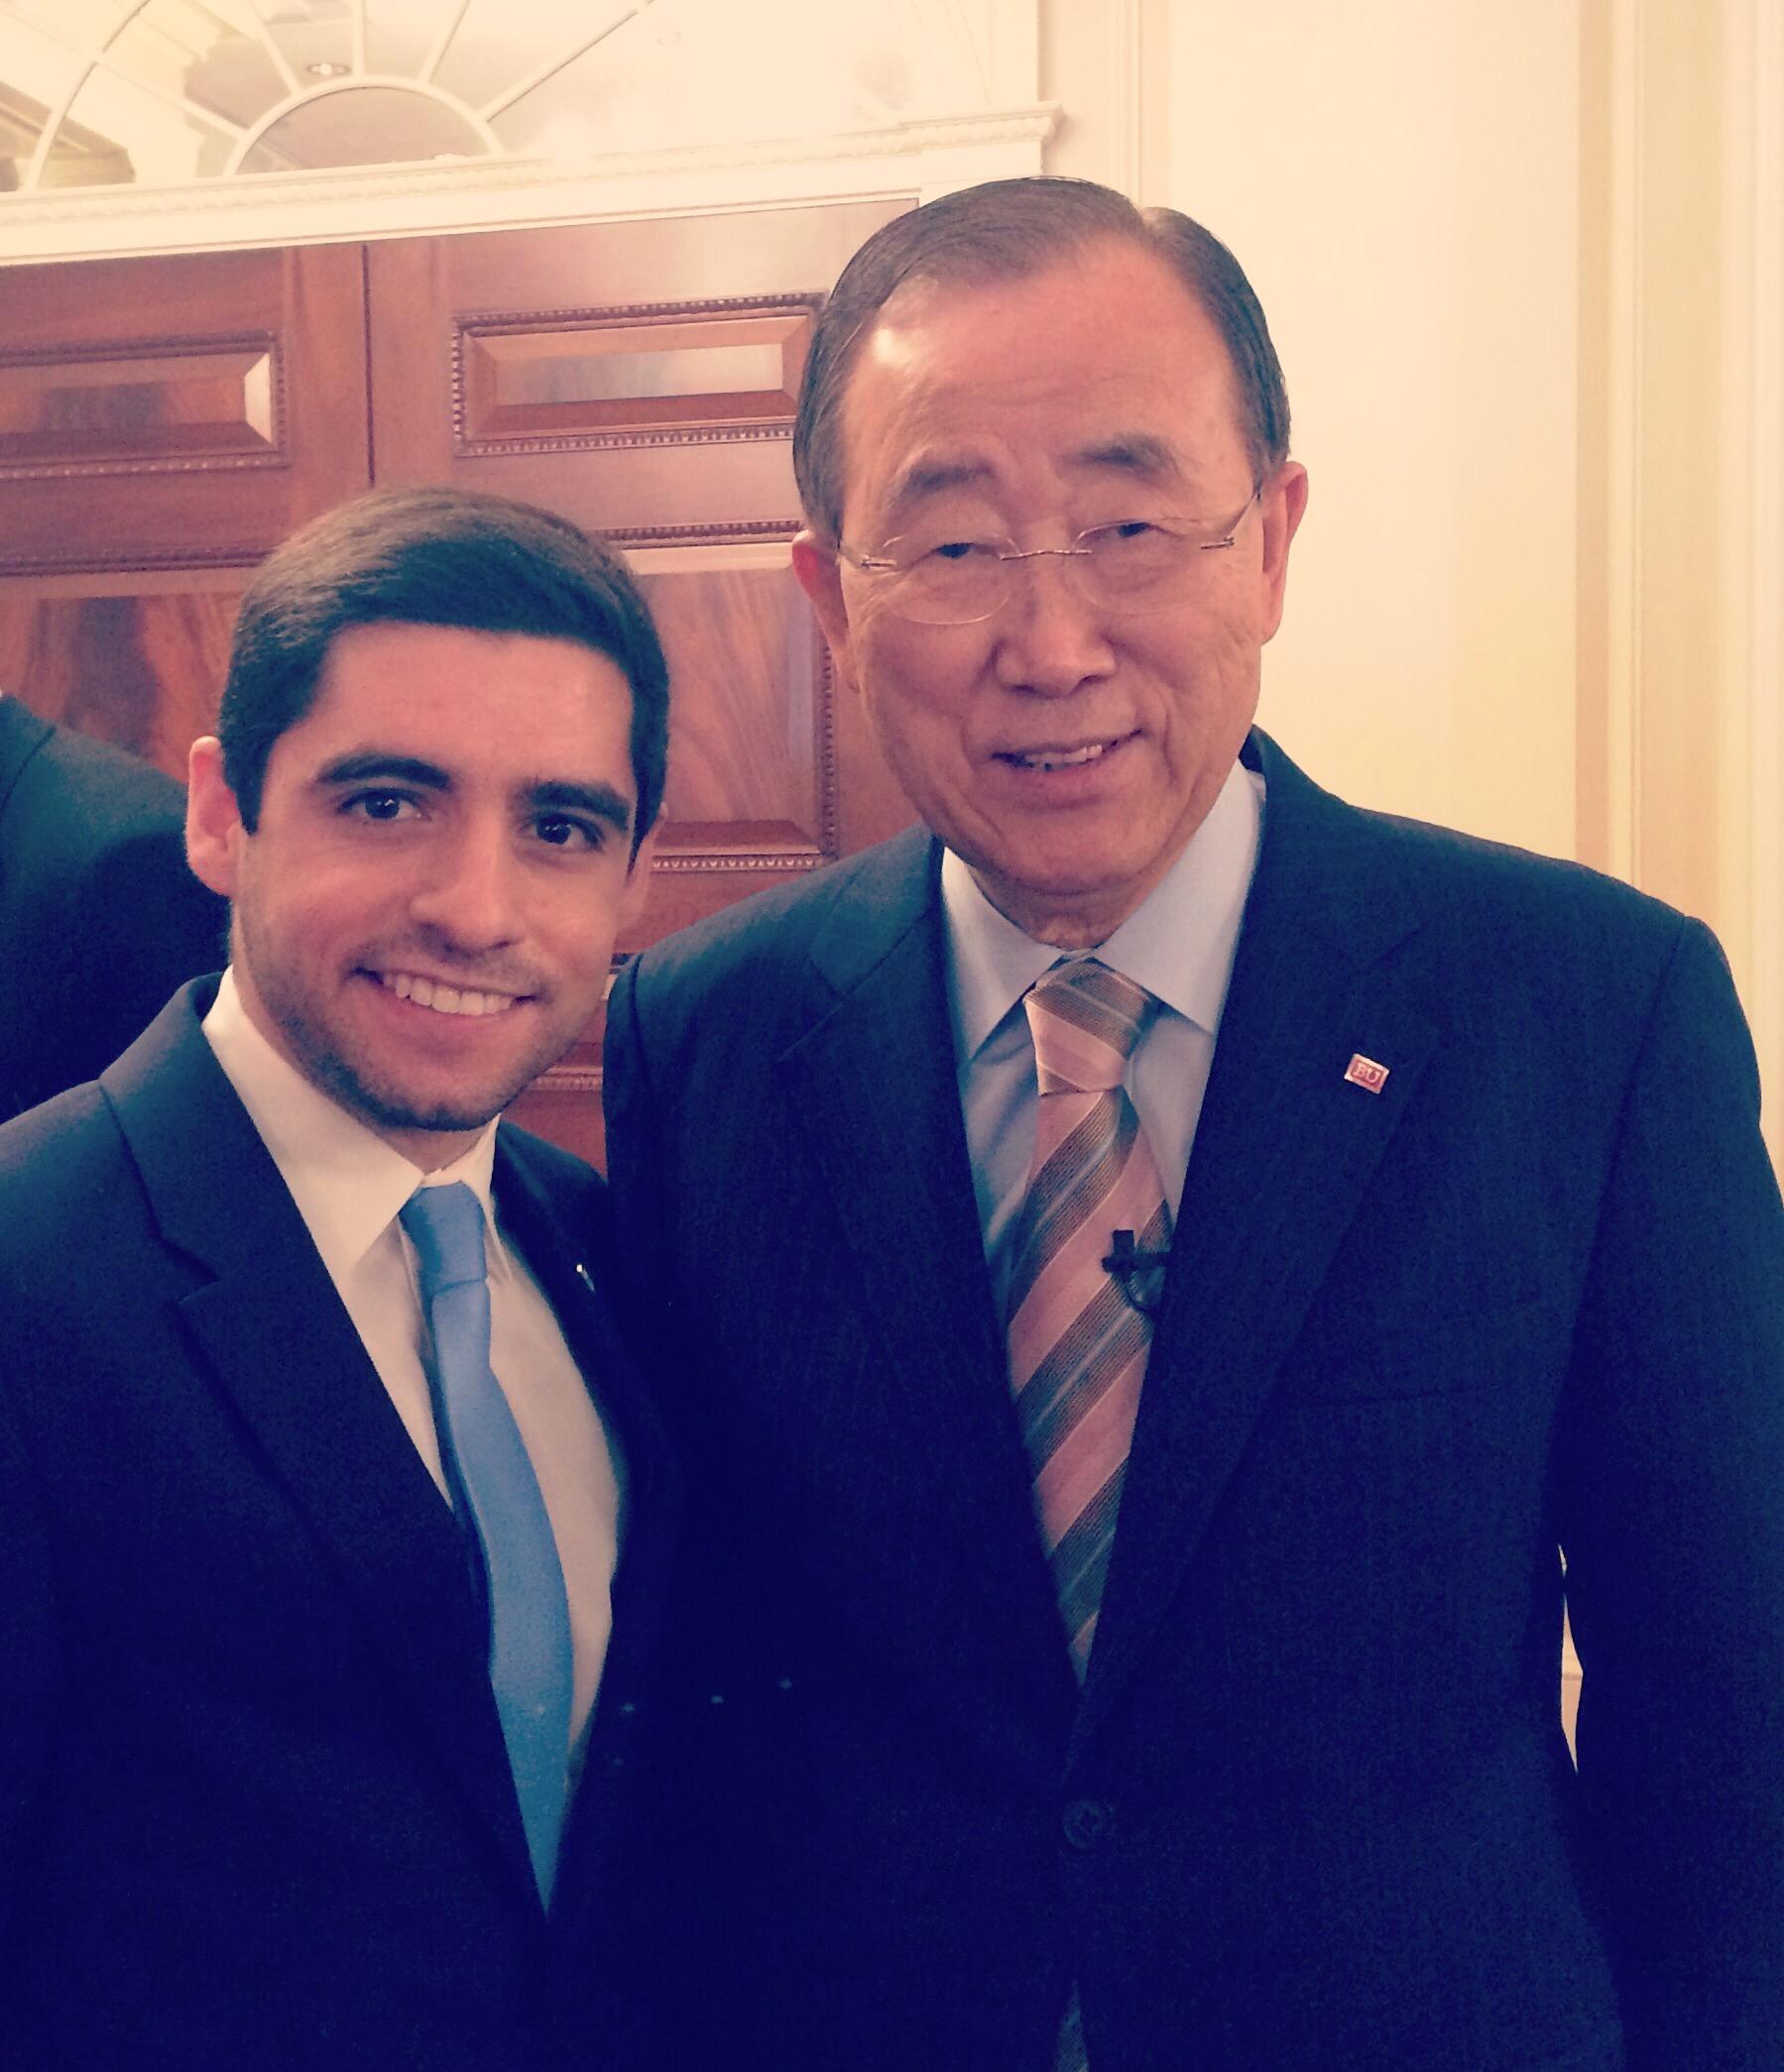 Sam Vaghar with H.E. Ban Ki-moon in Boston